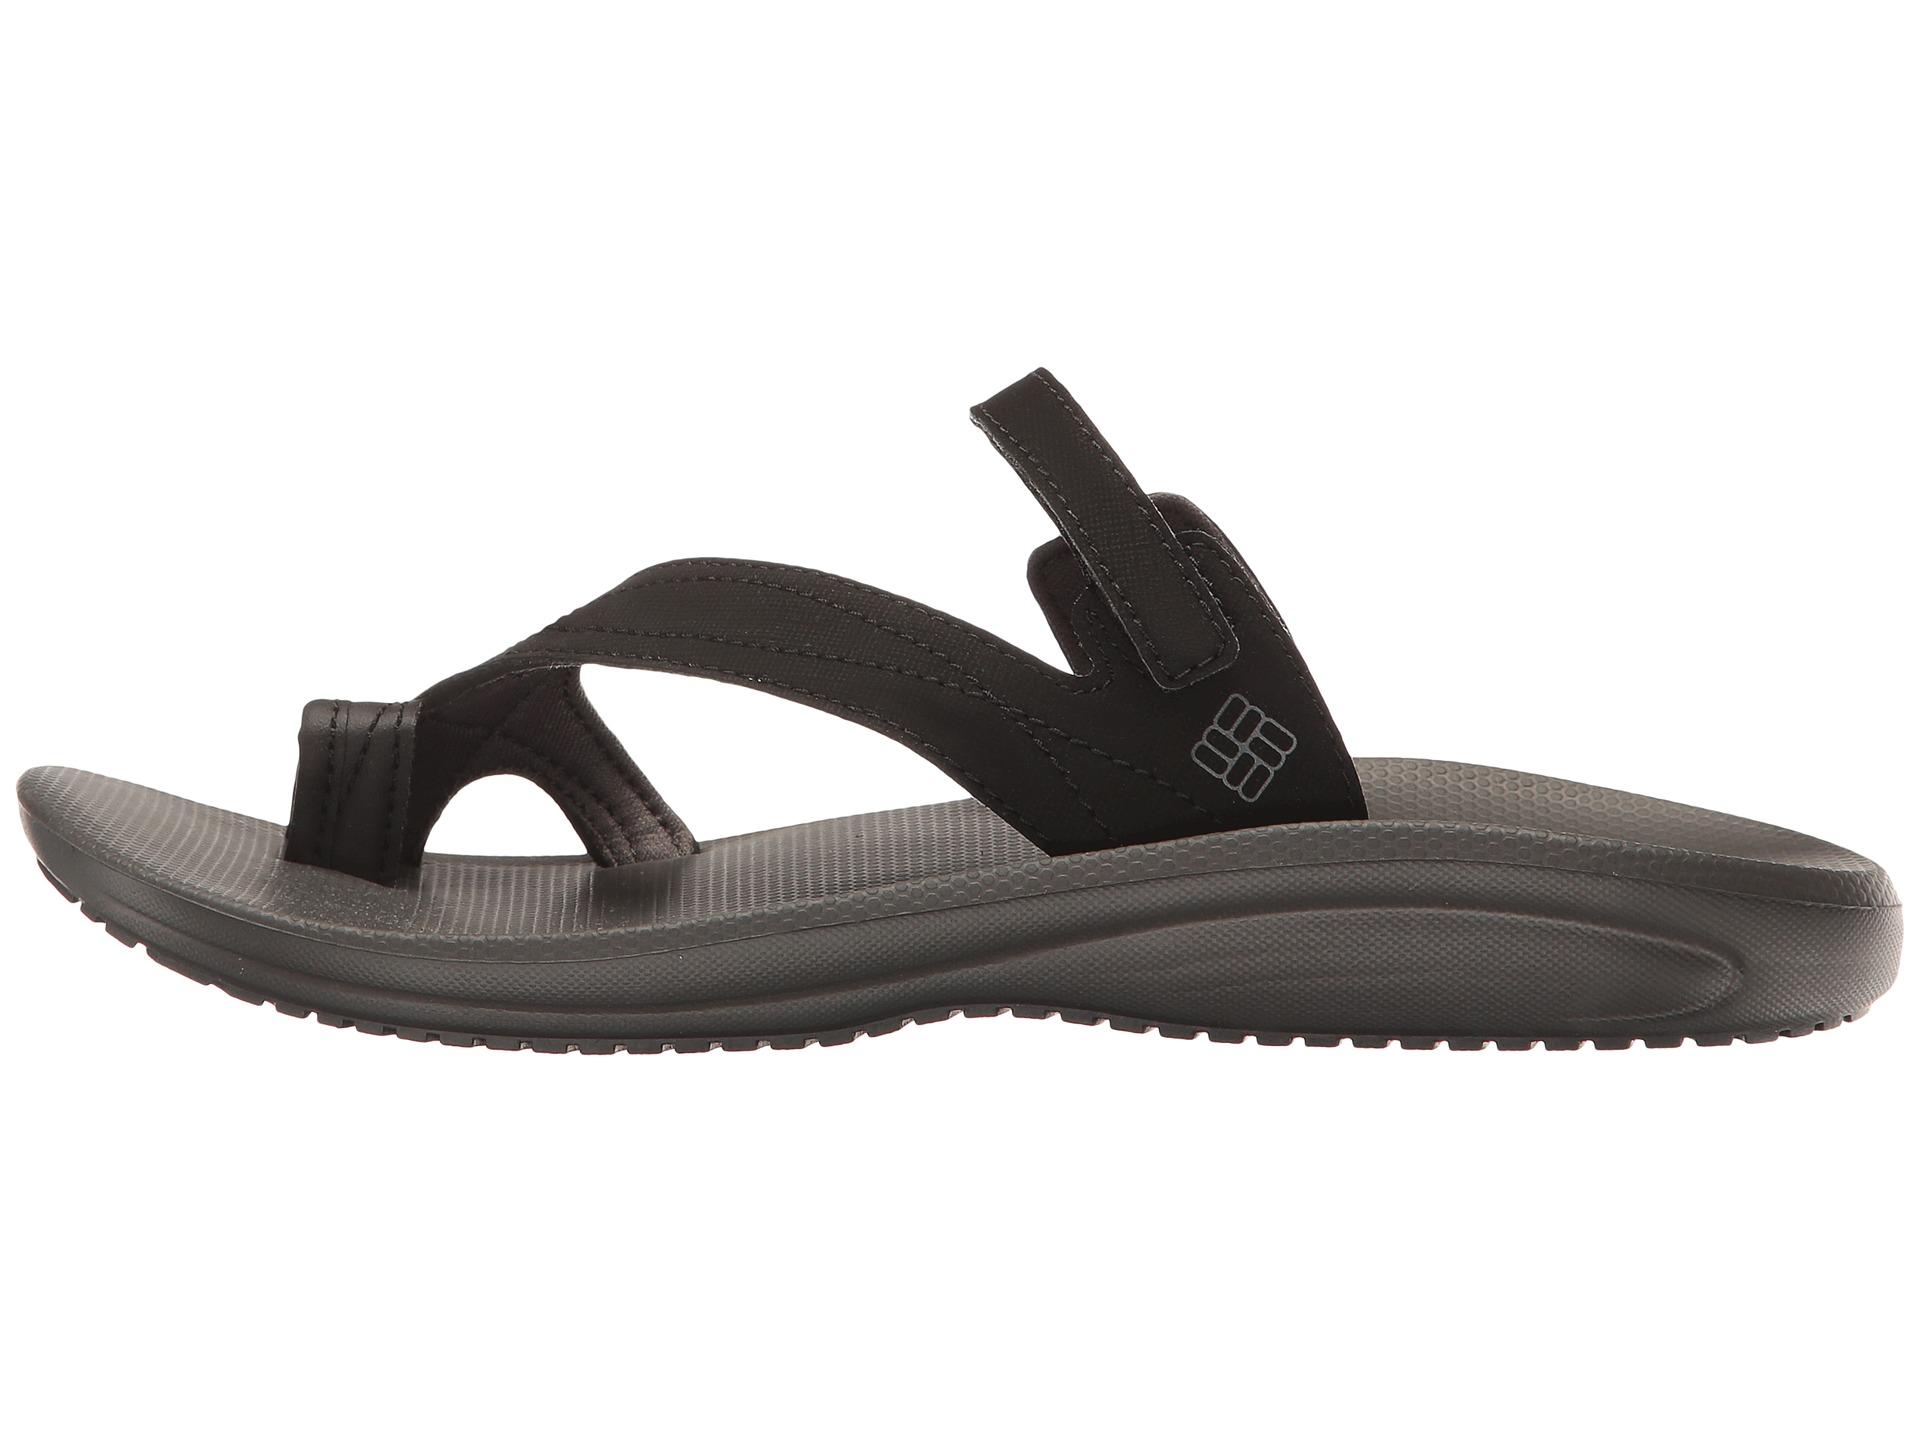 columbia barraca sunlight sandales